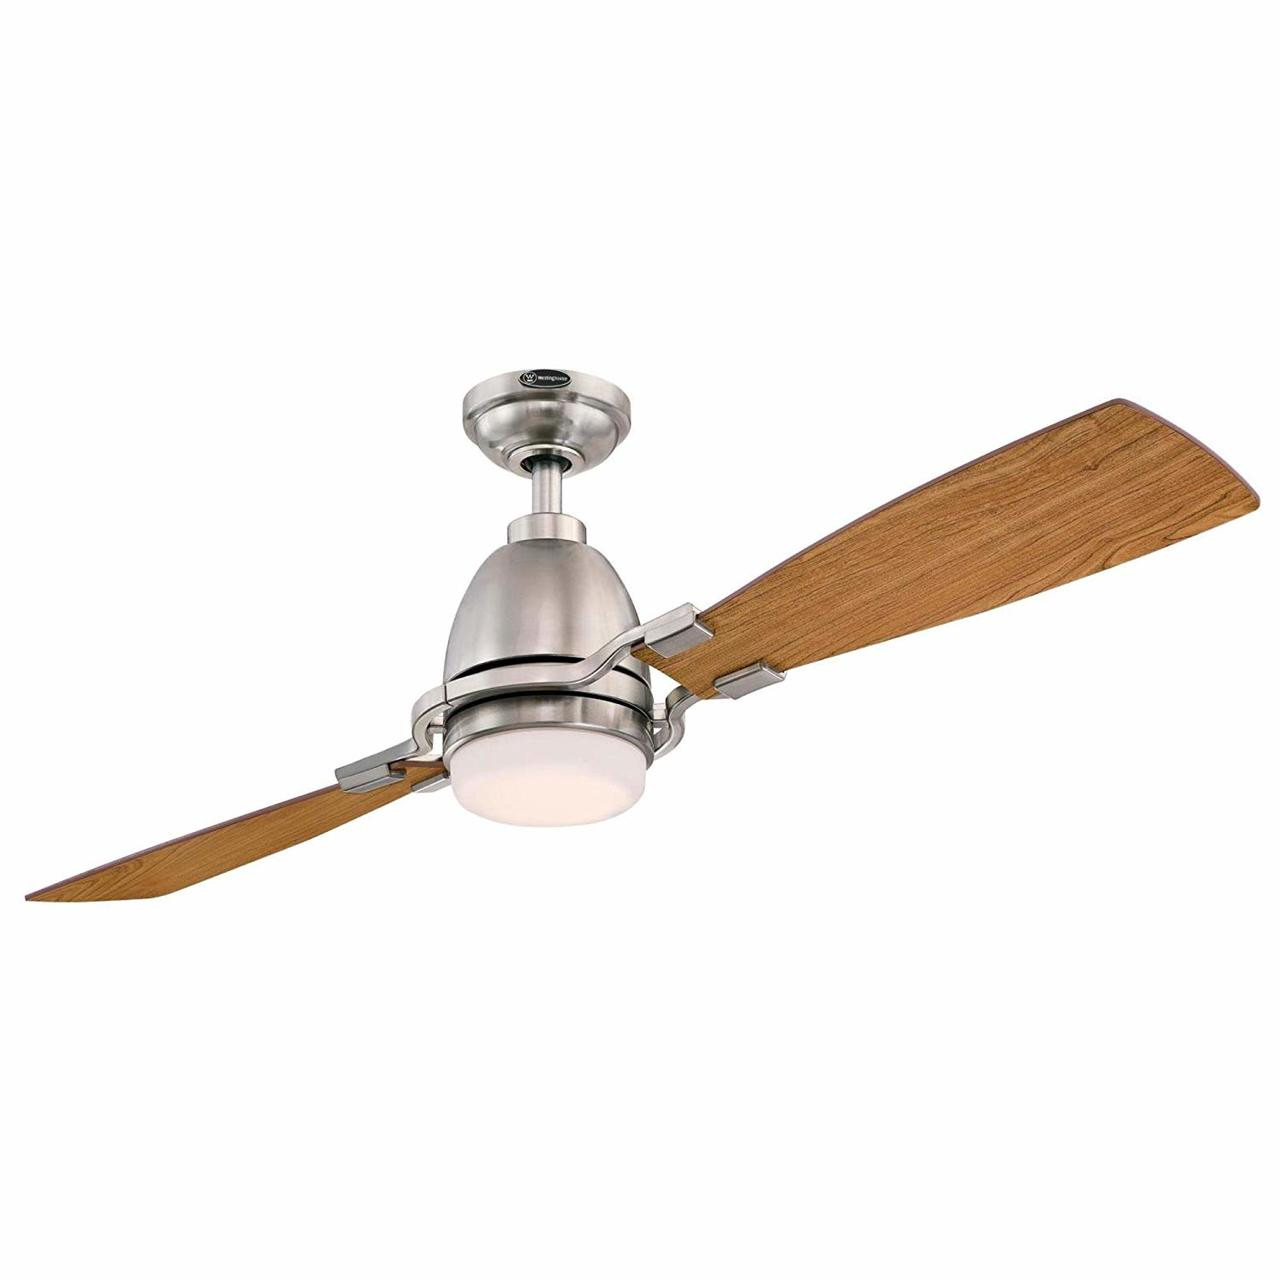 Westinghouse Longo 7217700 Brushed Nickel 54 Quot Ceiling Fan